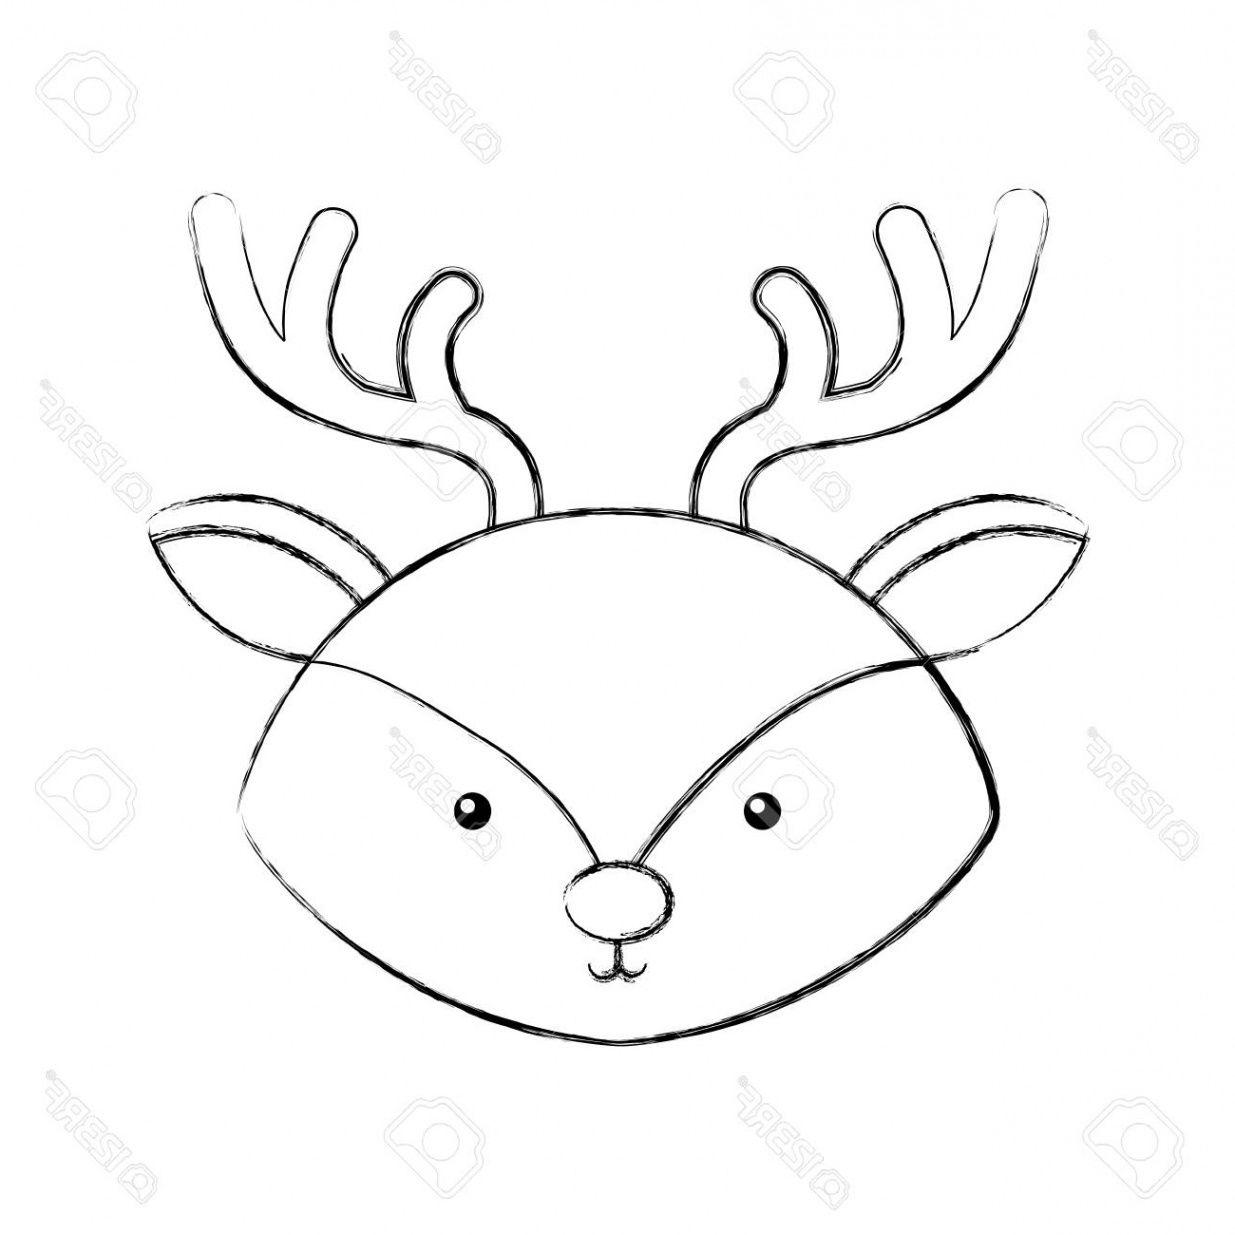 15 Cool De Renne Animal Dessin Photos Coloriage Dessin Renne Dessin Noel